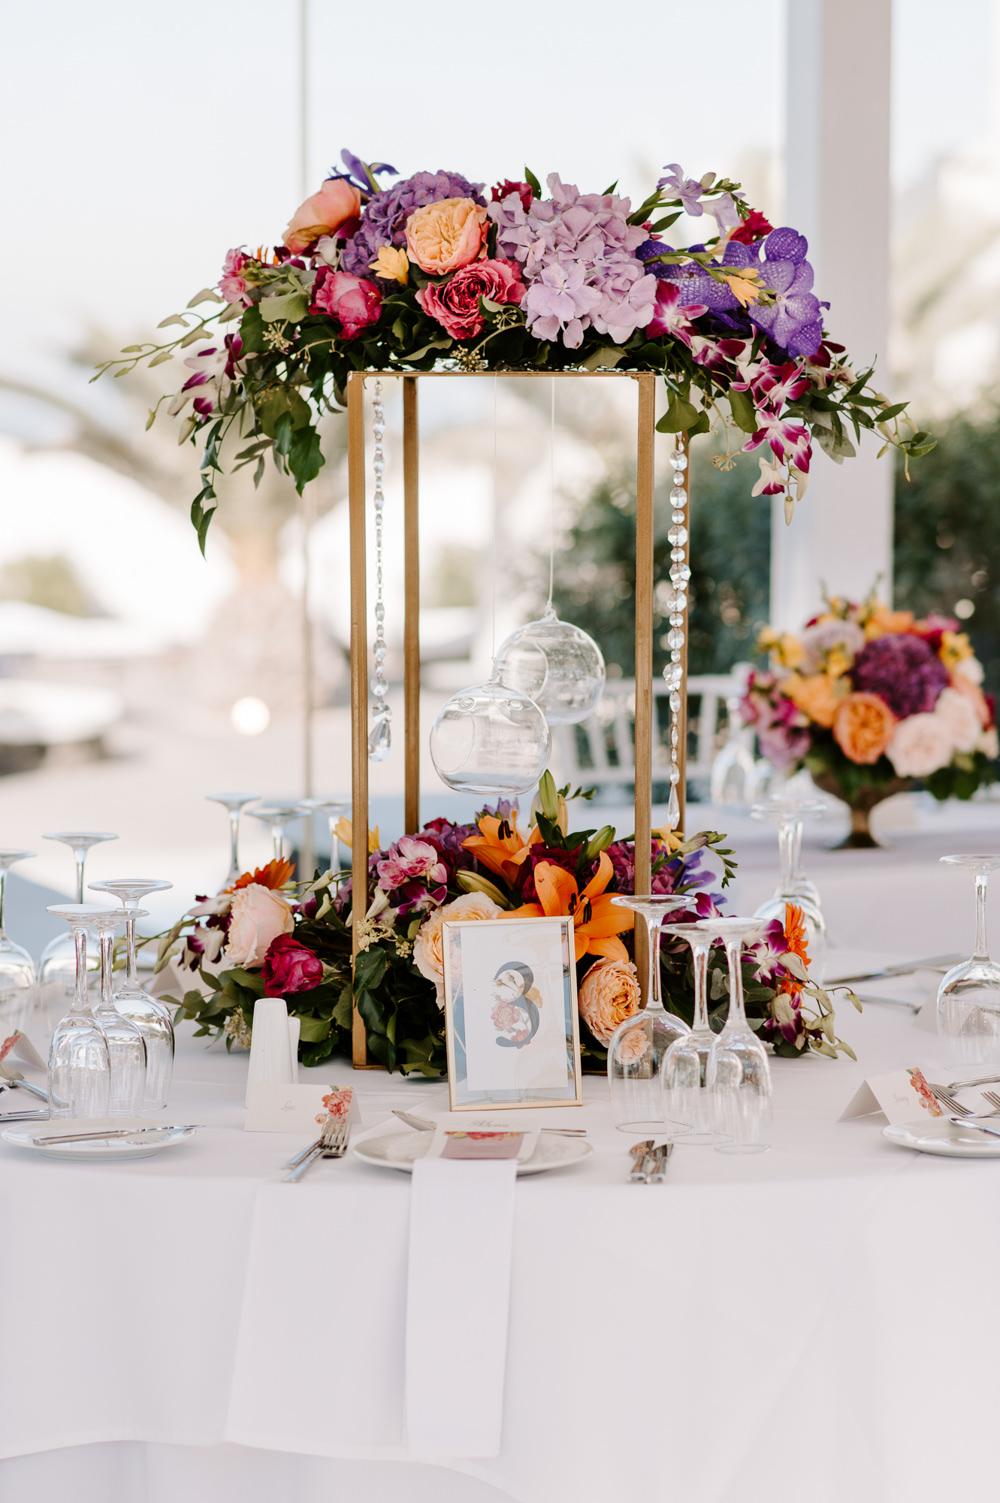 Table Flowers Centrepiece Colourful Tall Candles Decor Santorini Wedding Phosart Photography